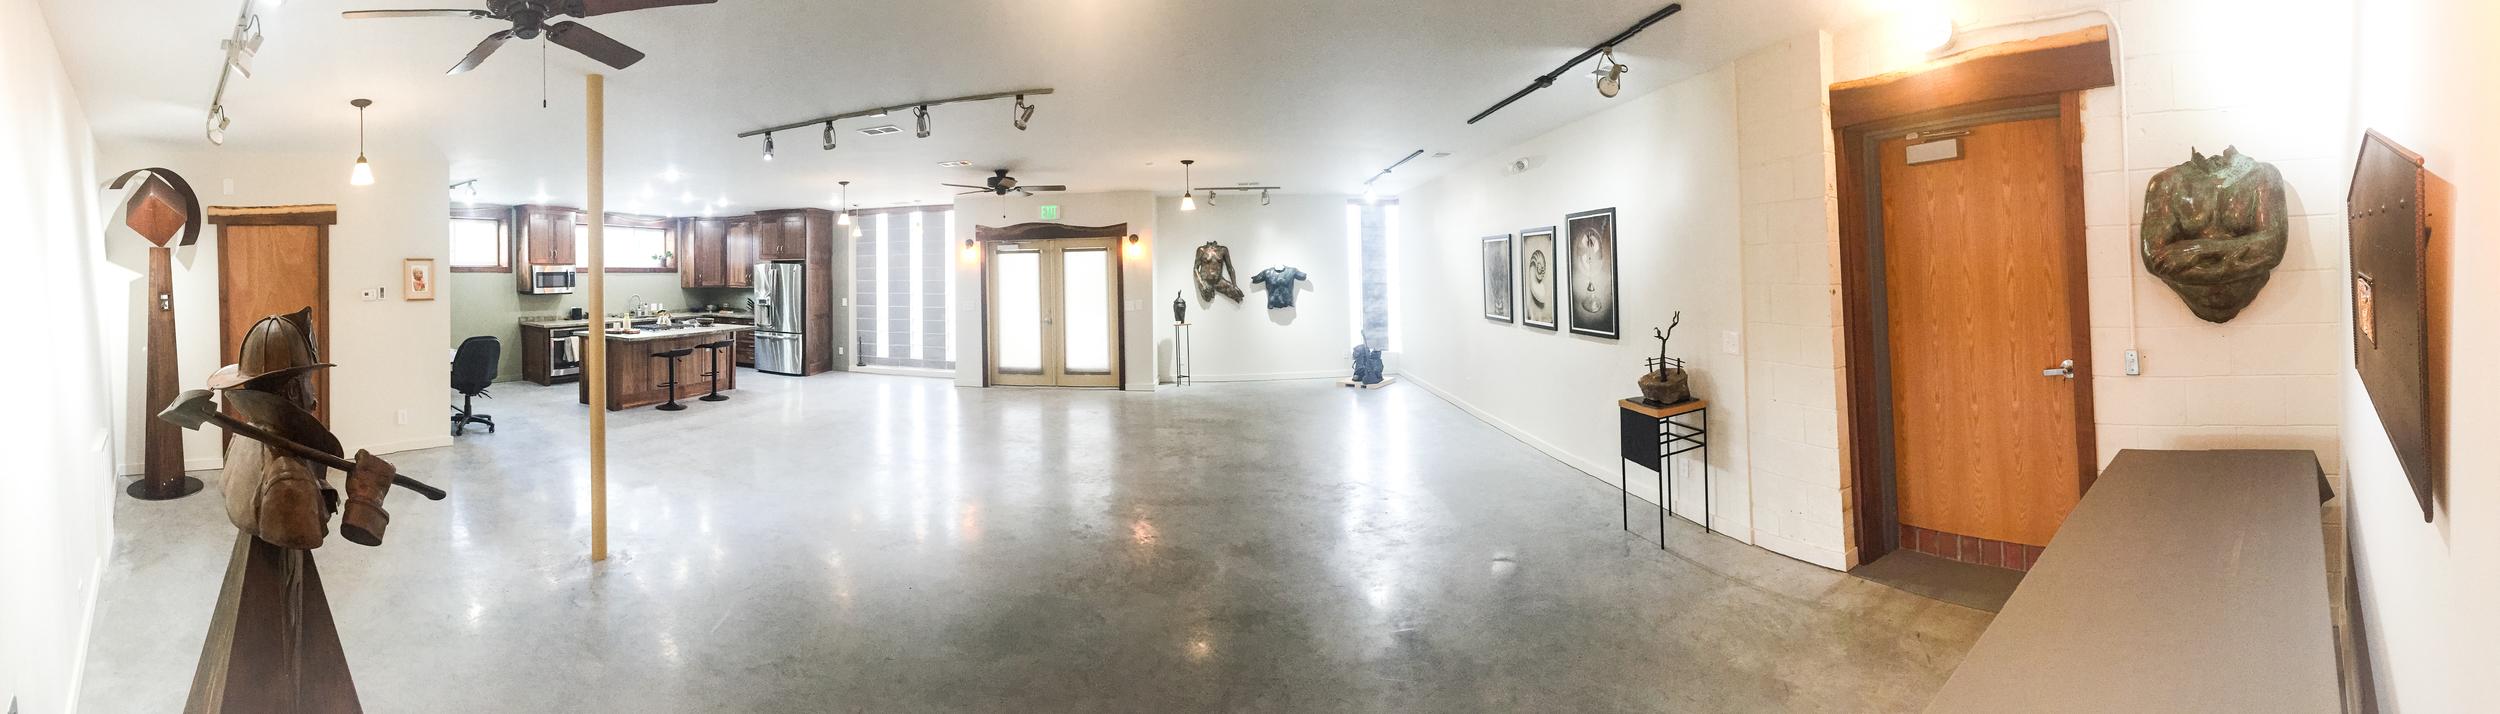 EYA Facade & Interior-101.jpg